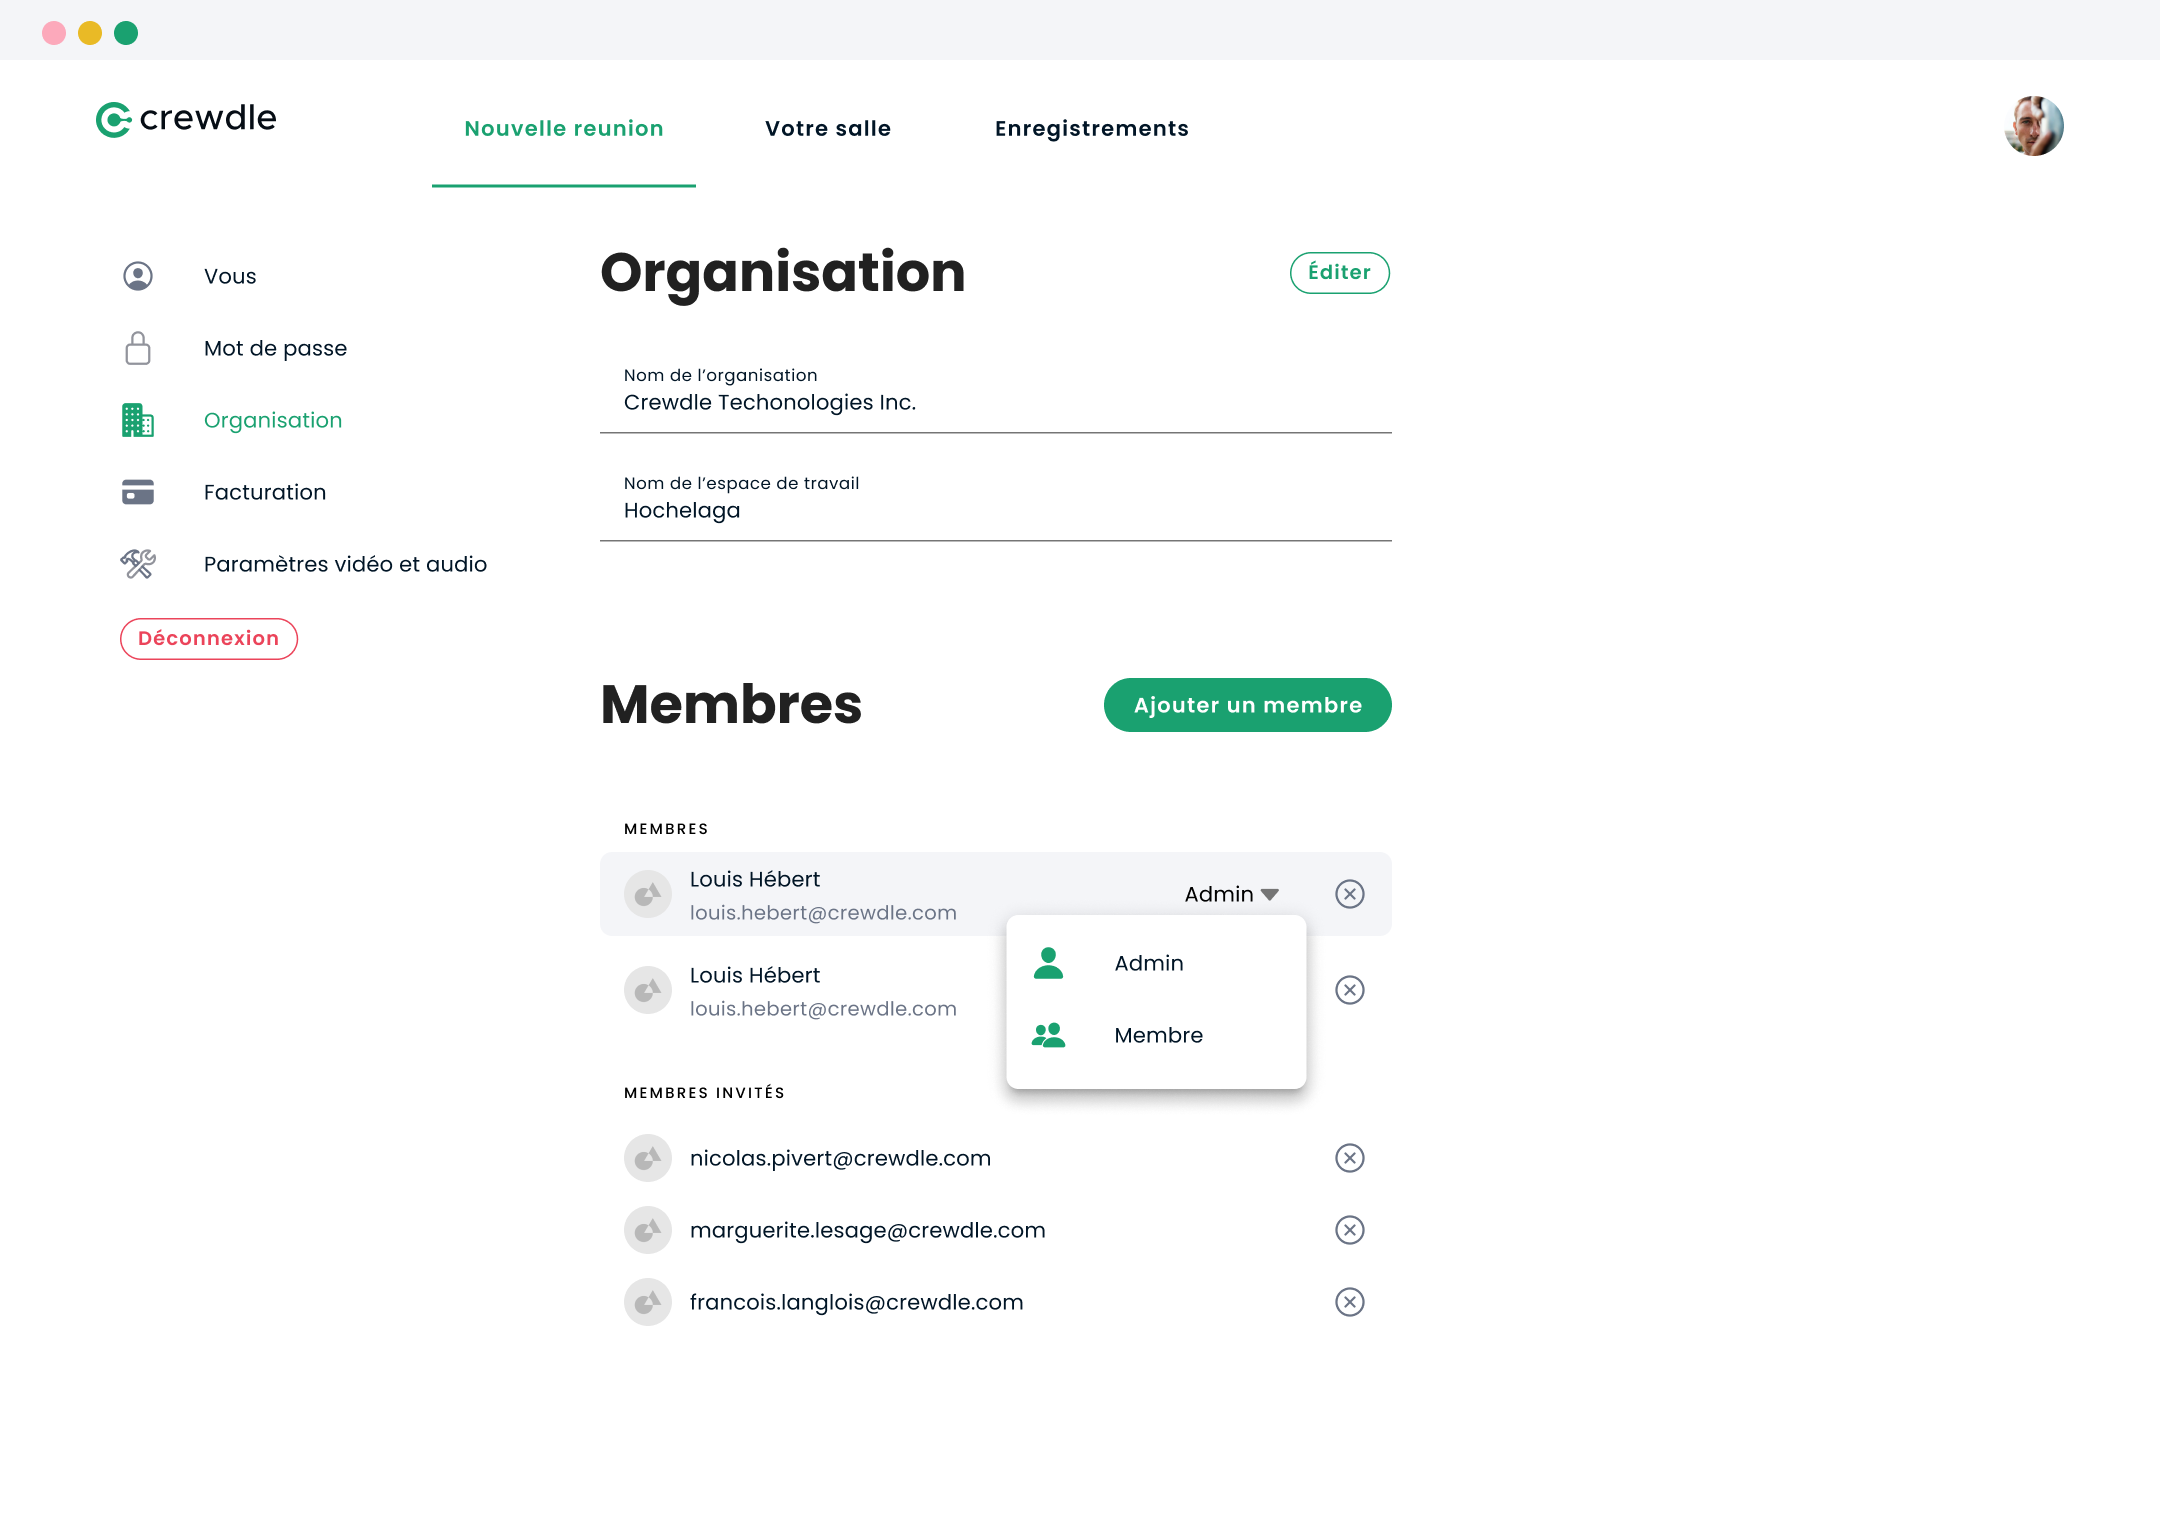 Organization setup in the Crewdle desktop interface